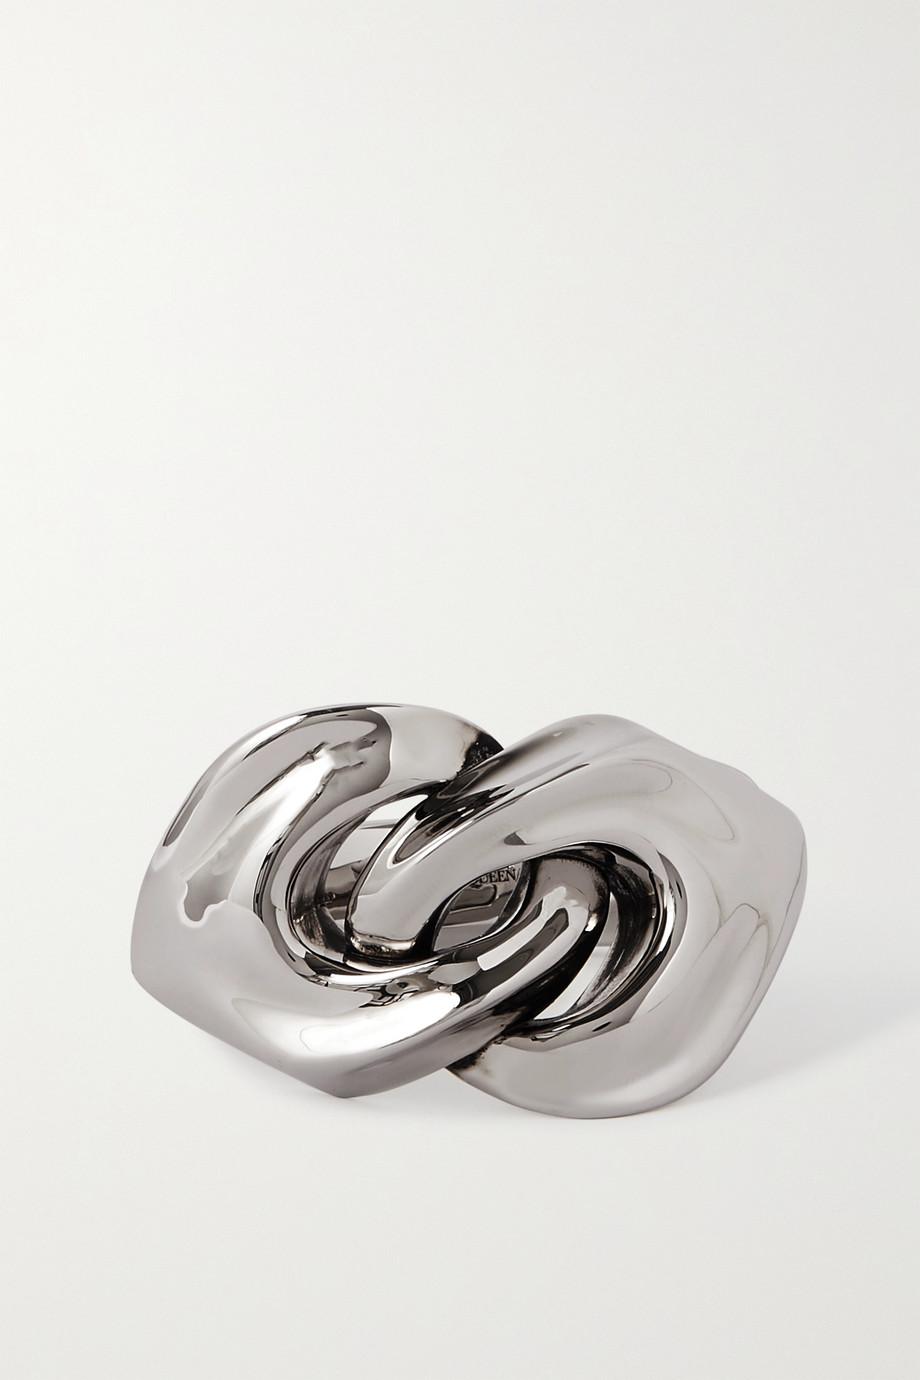 Alexander McQueen Silver-tone bracelet